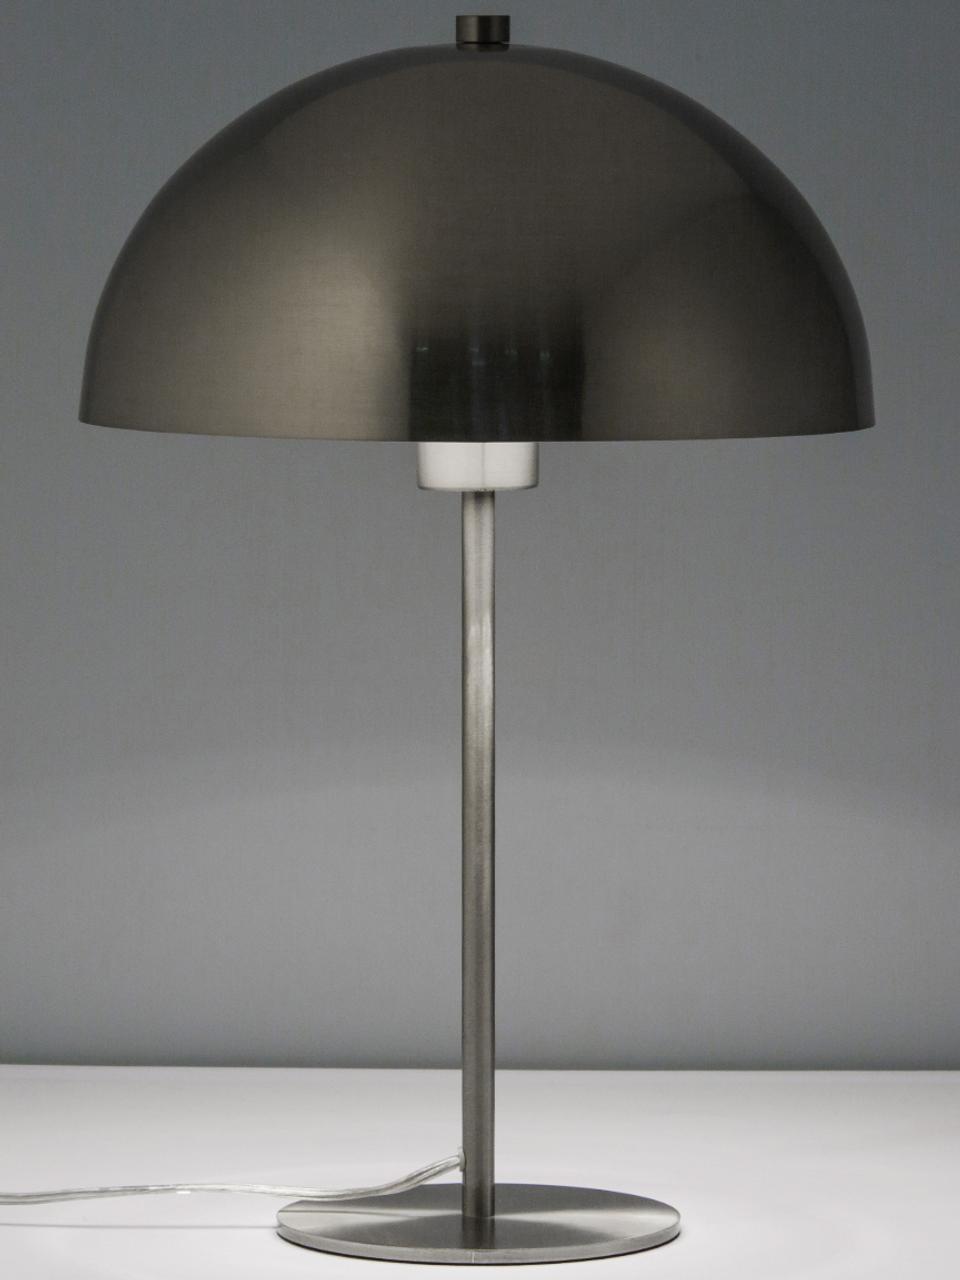 Lampada da tavolo in metallo Matilda, Paralume: metallo nichelato, Base della lampada: metallo nichelato, Nichel, Ø 29 x Alt. 45 cm